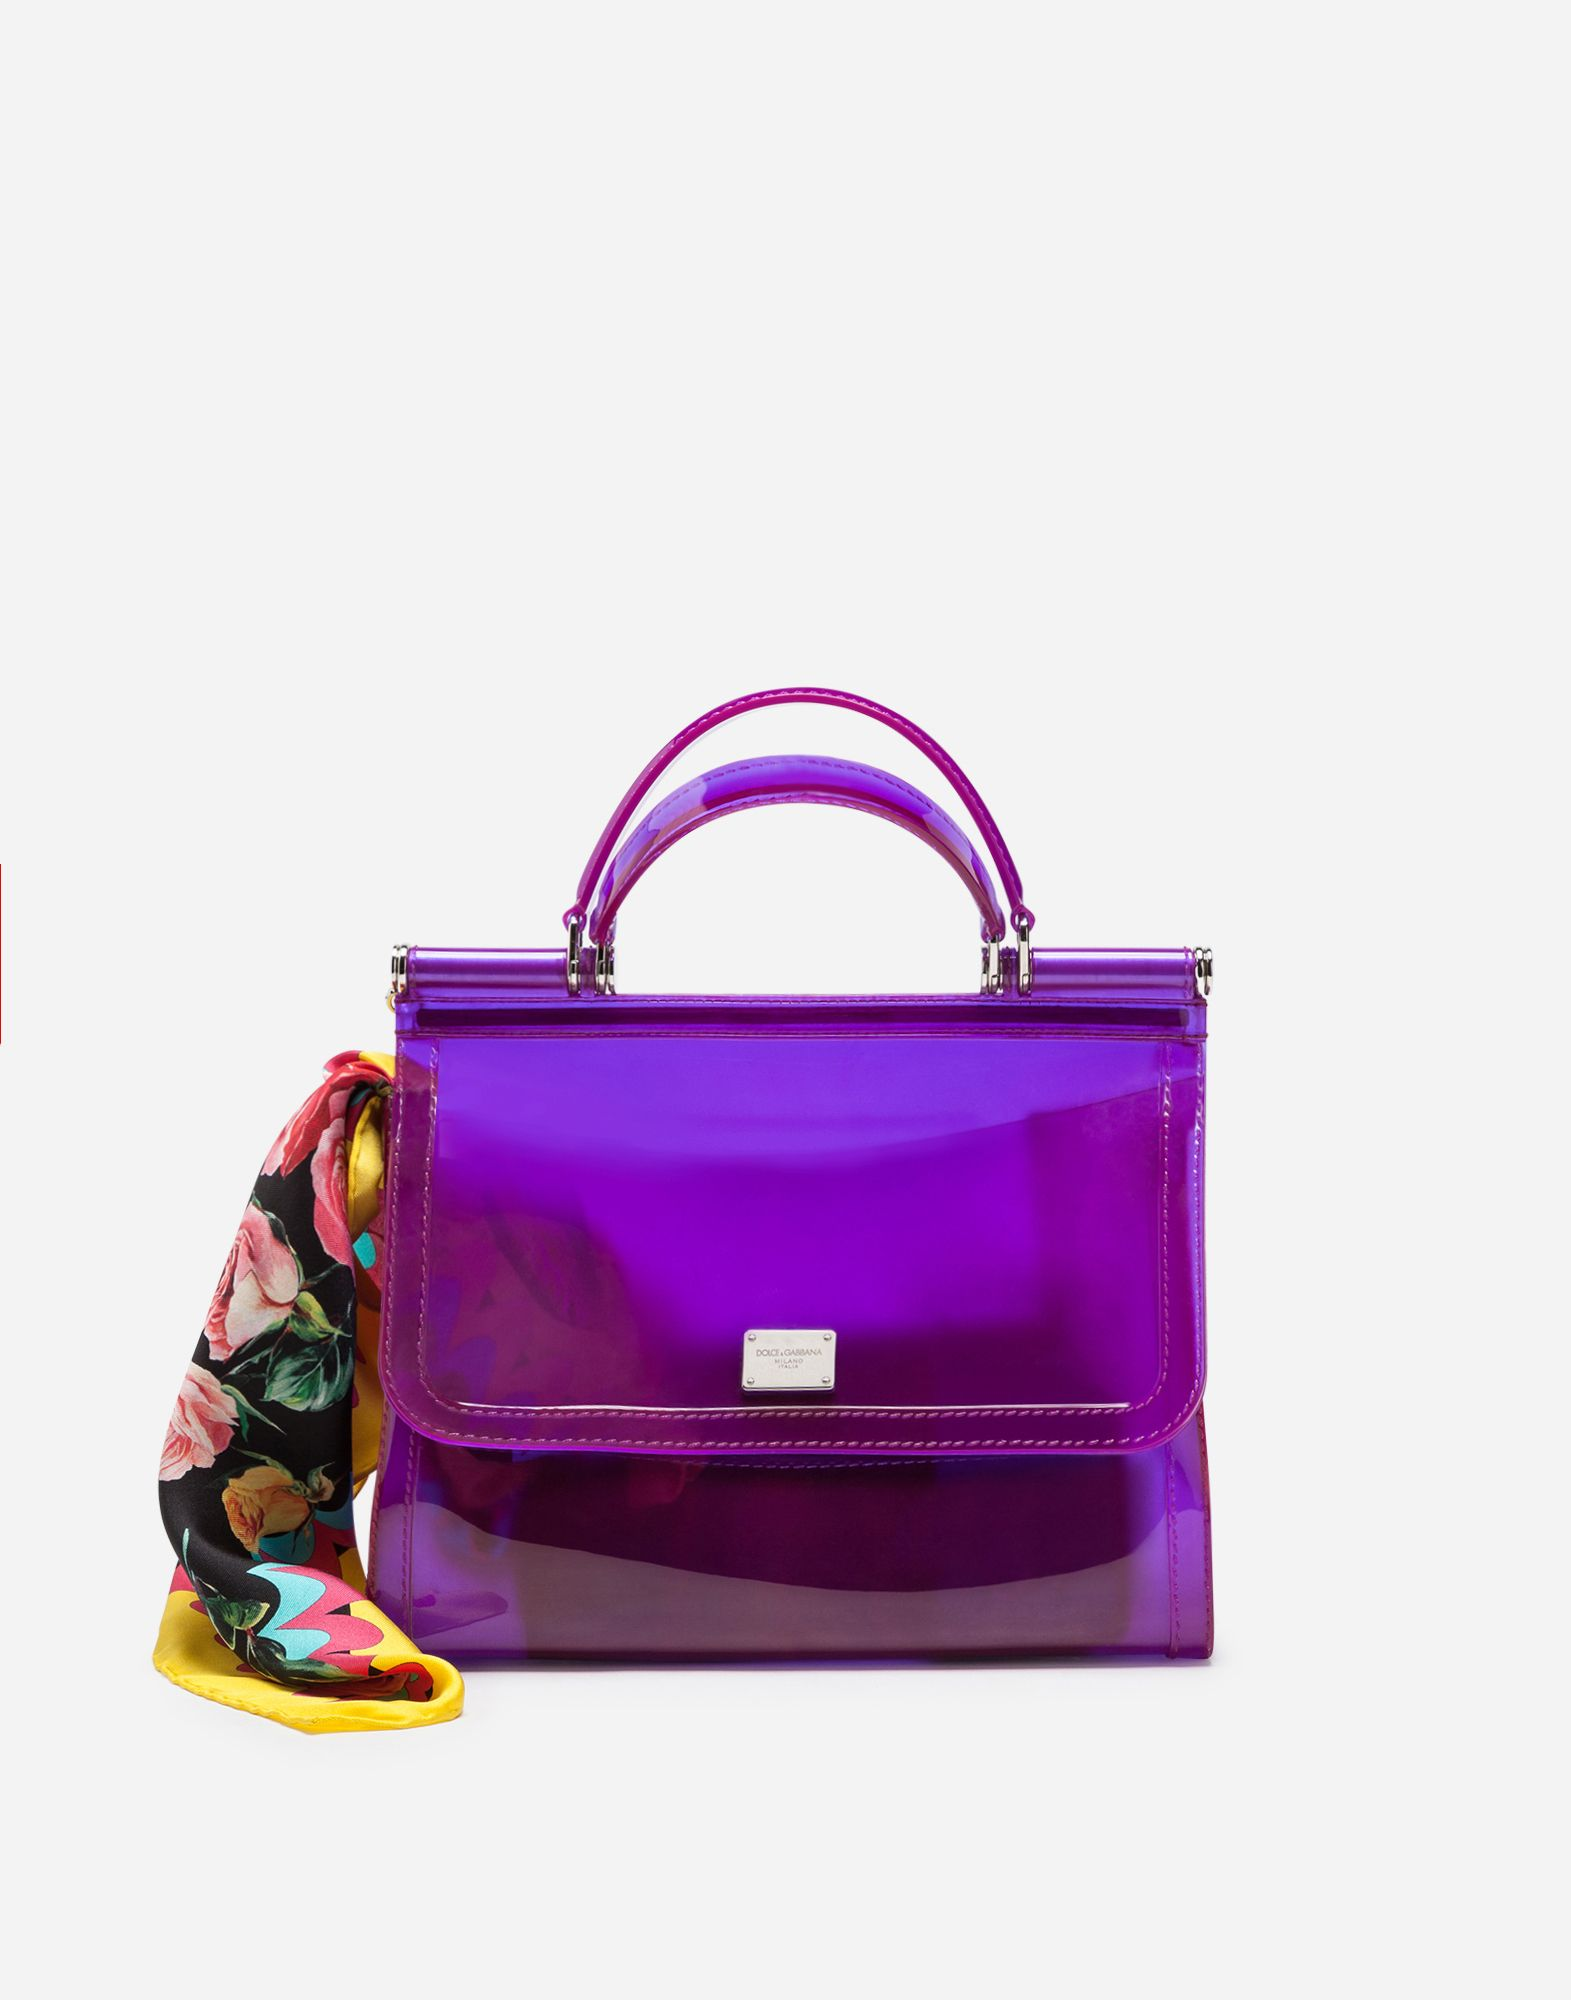 2f67a30b5a60 Dolce   Gabbana - Semi-transparent rubber purple Sicily handbag ( 995)